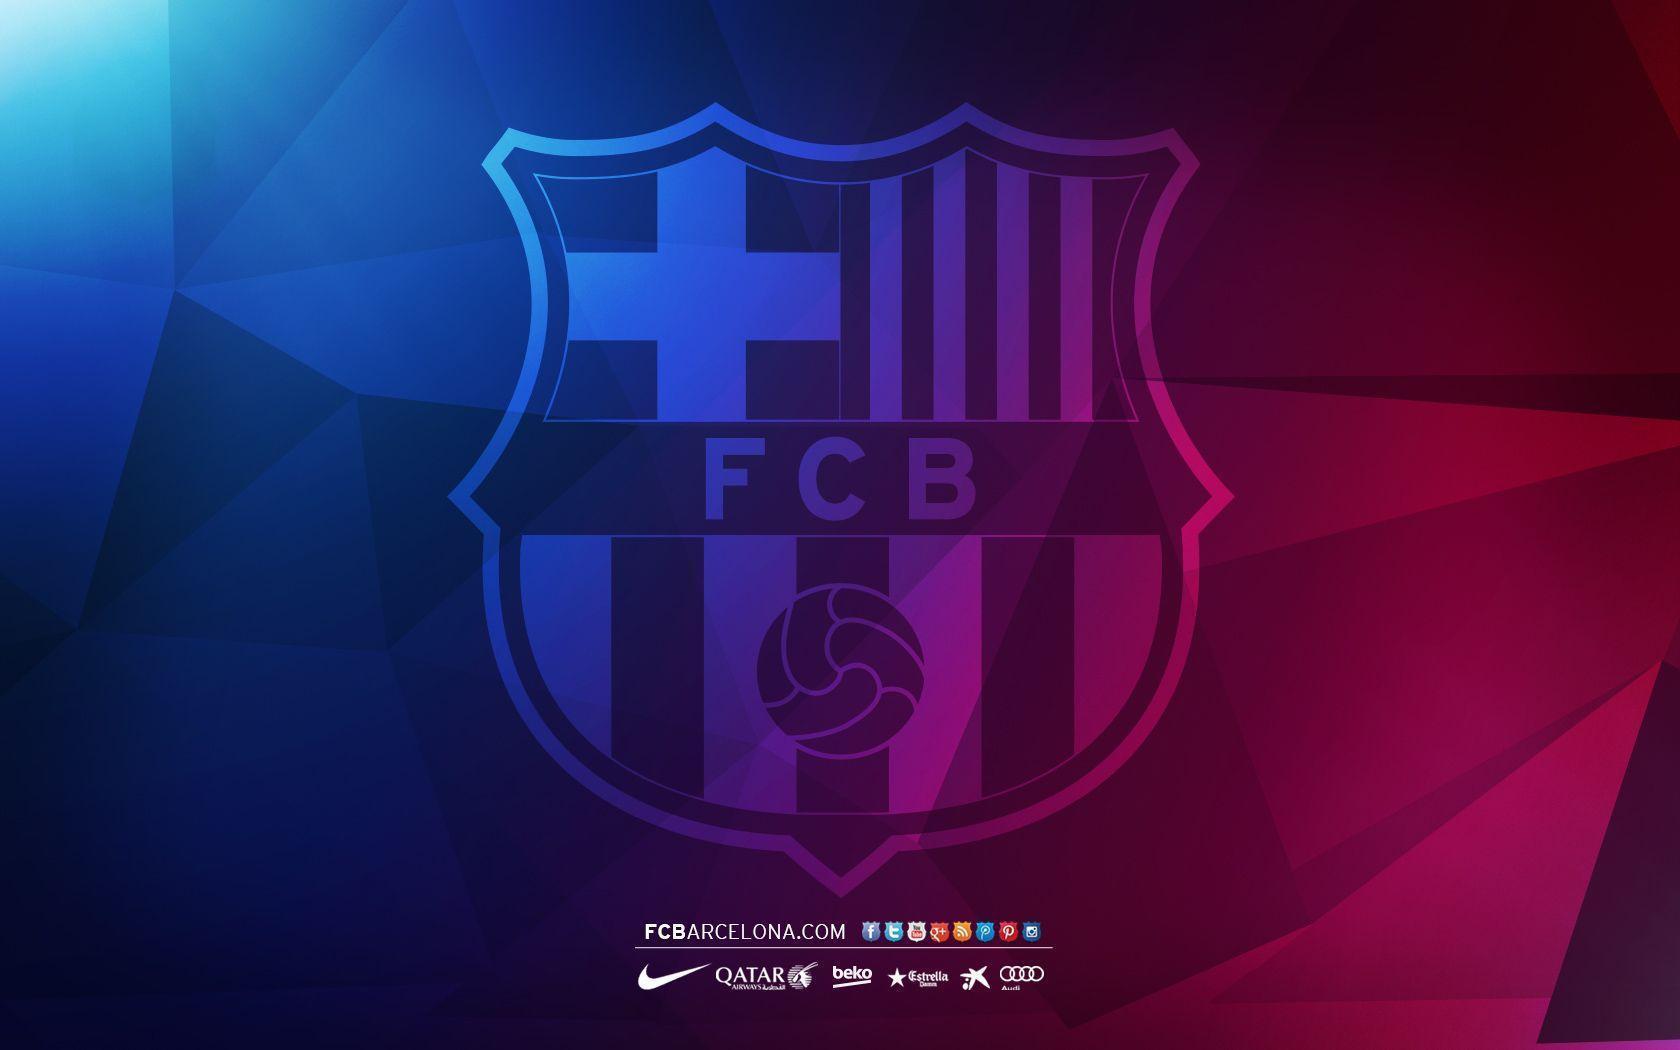 FCB crest 04 - Wallpaper - FC Barcelona